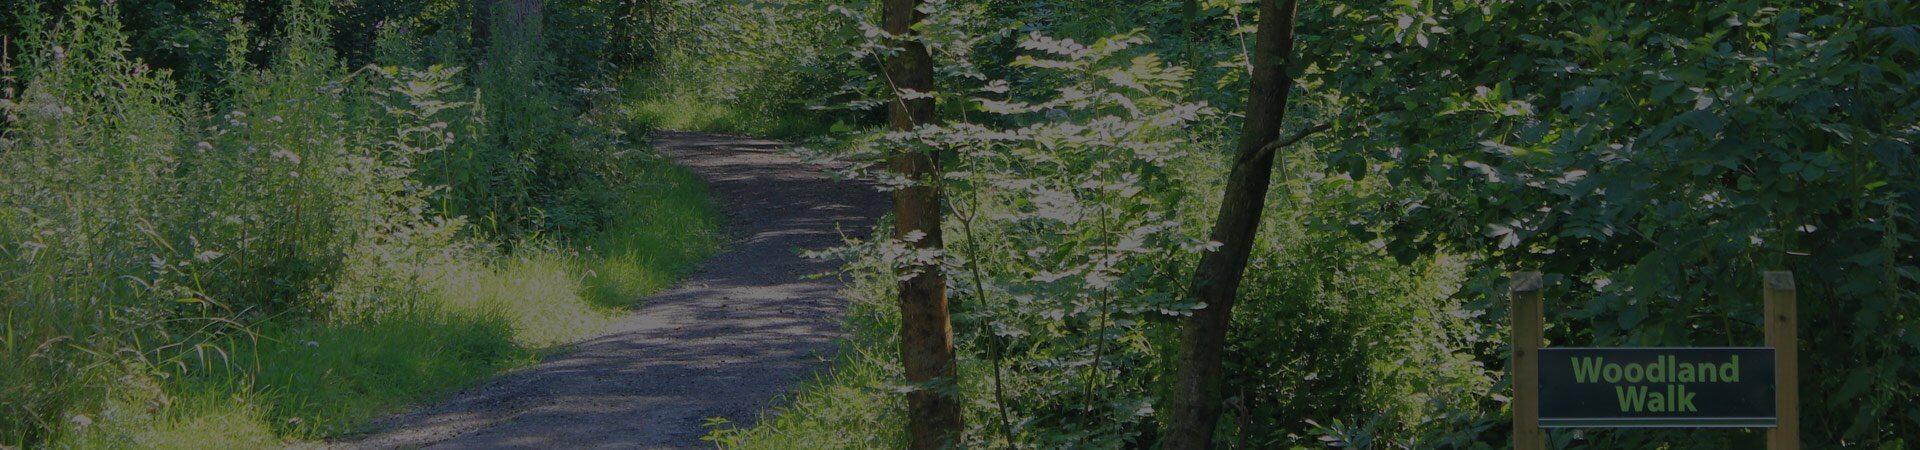 a woodland walk at Old Hall Caravan Park in Lancashire